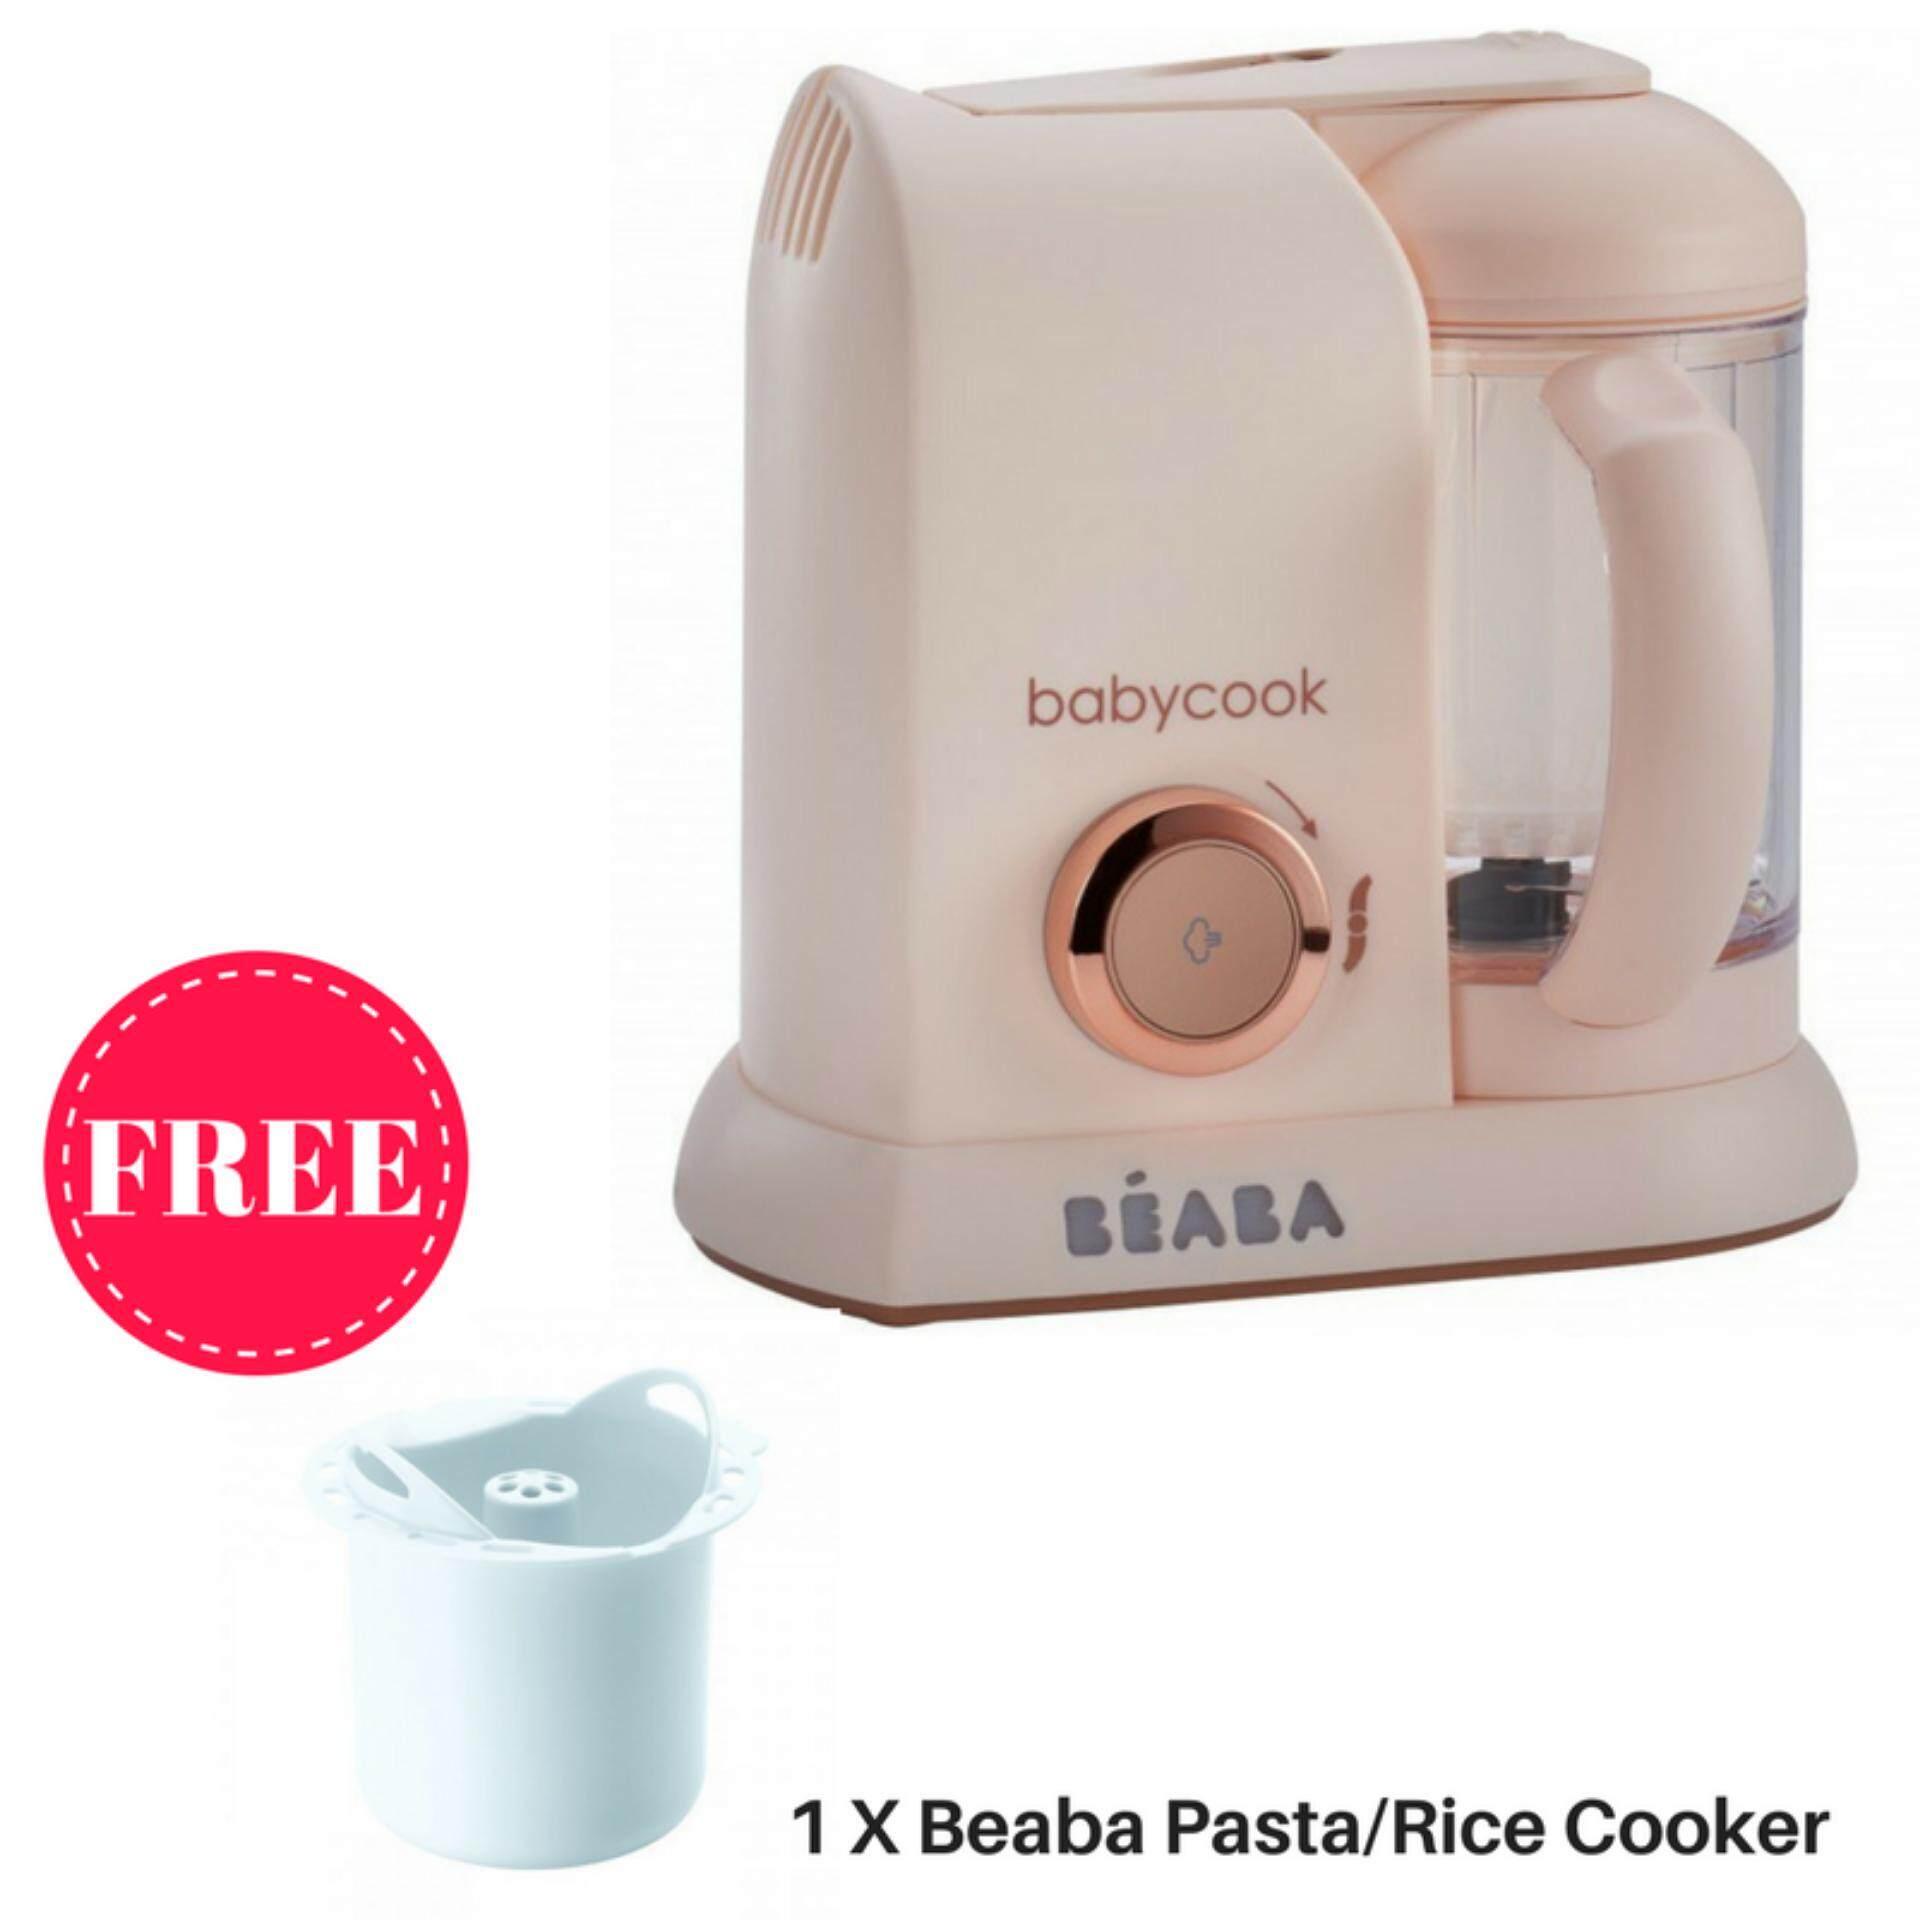 Features Beaba Babycook Essential Bundle Dan Harga Terbaru Info Duo Plus Grey Macaron Pink Free Pasta Rice Cooker